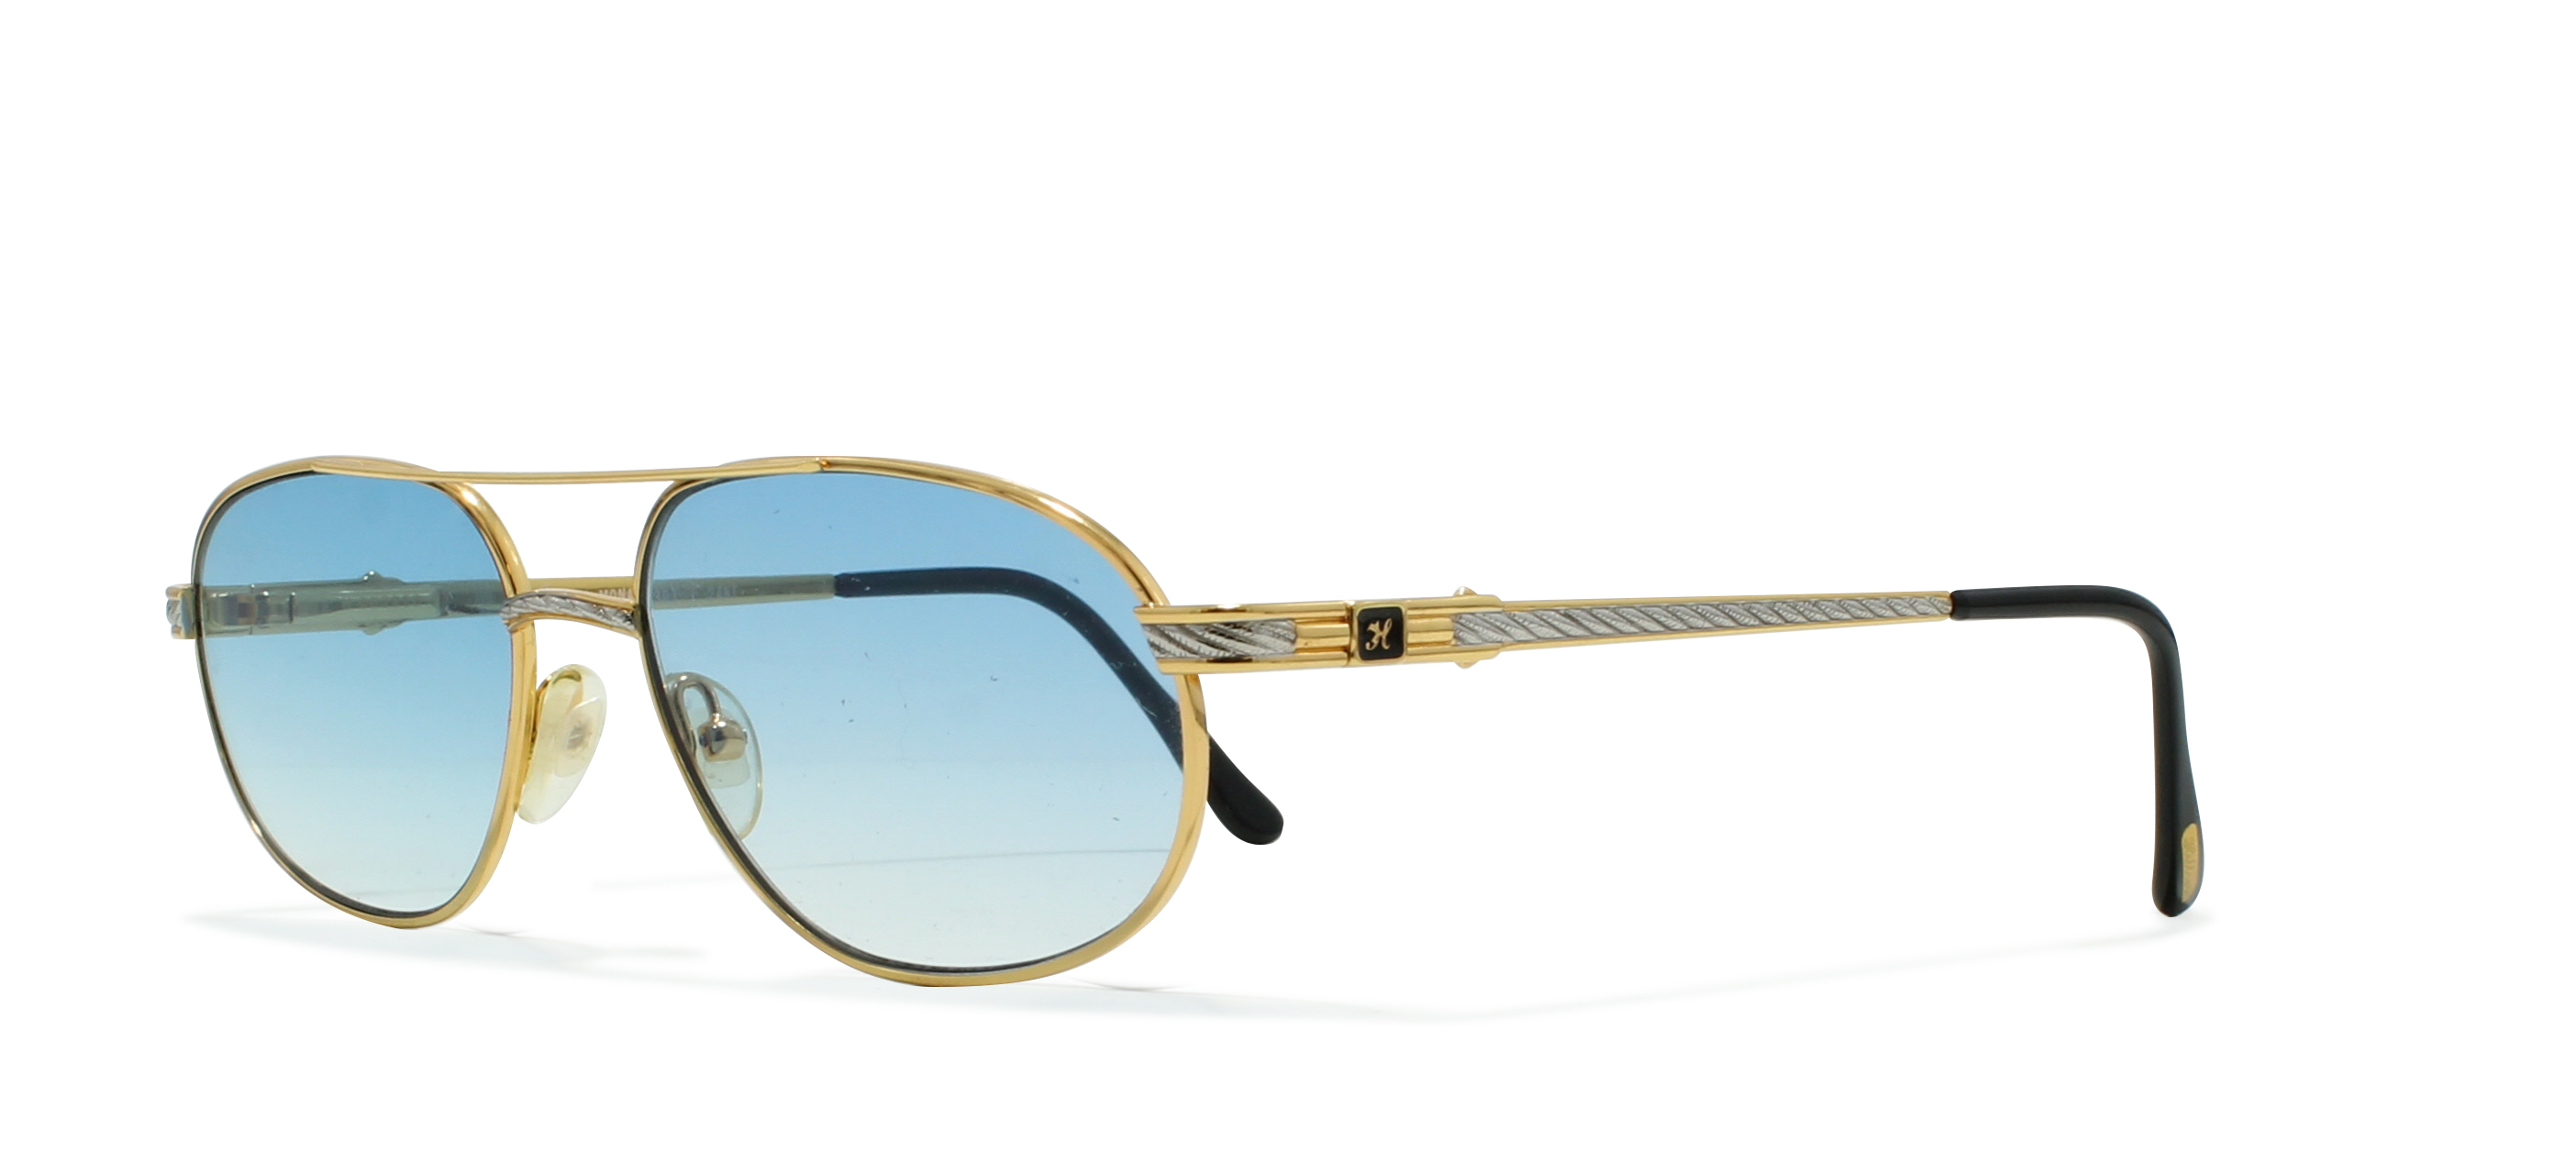 bcbc5e9b4c Hilton Monaco 307 1 Gold Vintage Sunglasses Rectangular For Men and Women